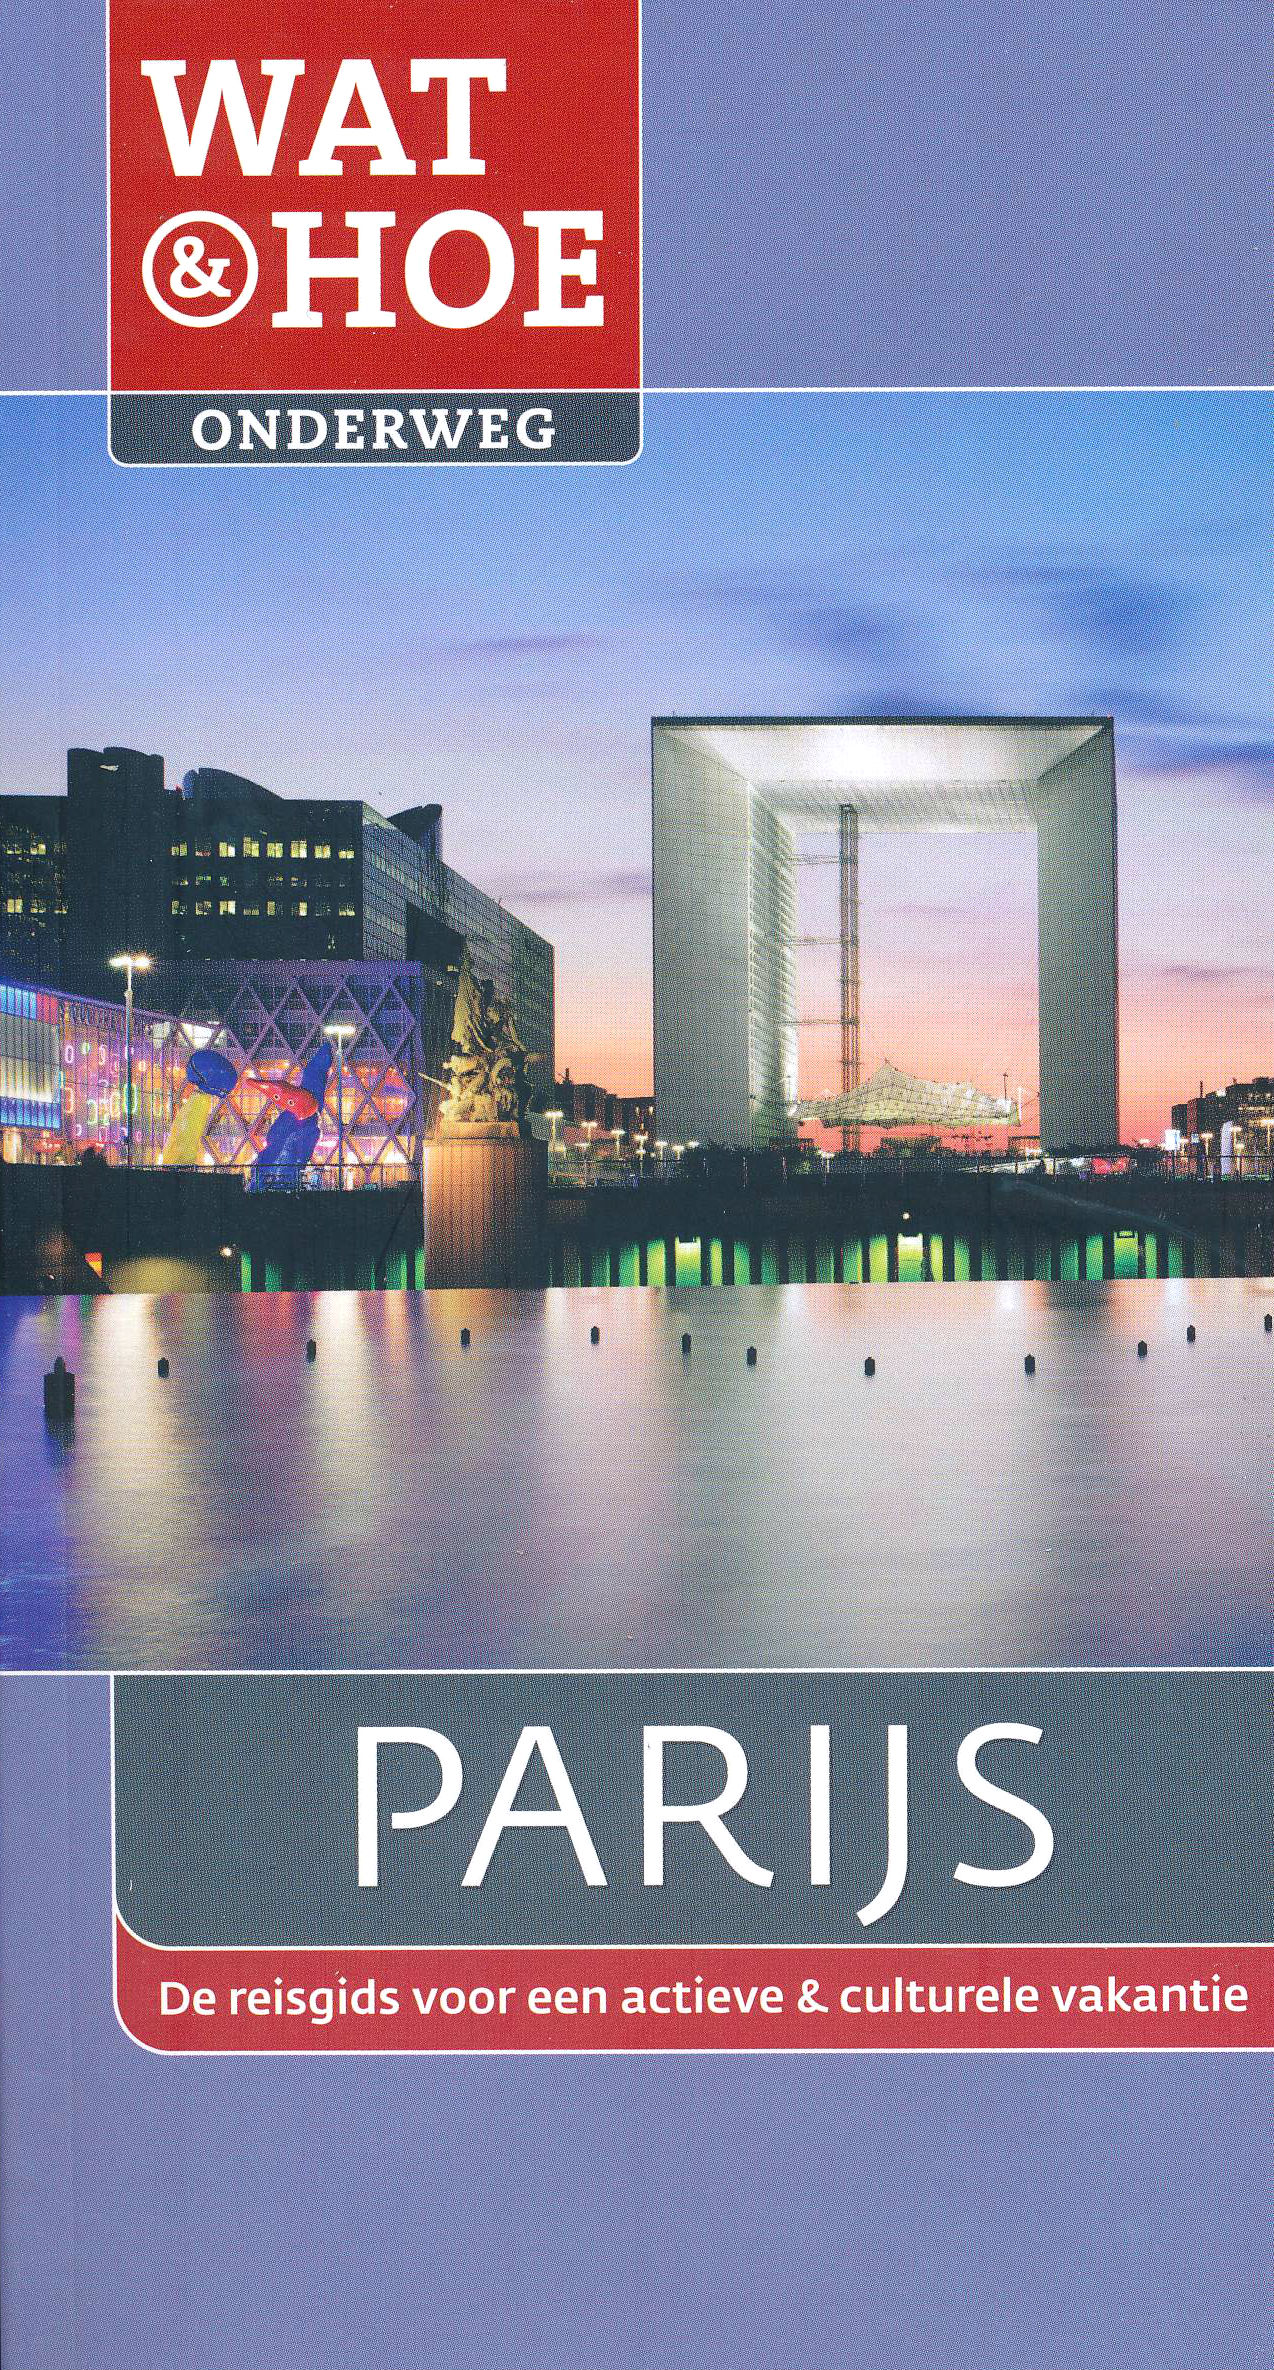 Reisgids Wat en Hoe Parijs   Kosmos